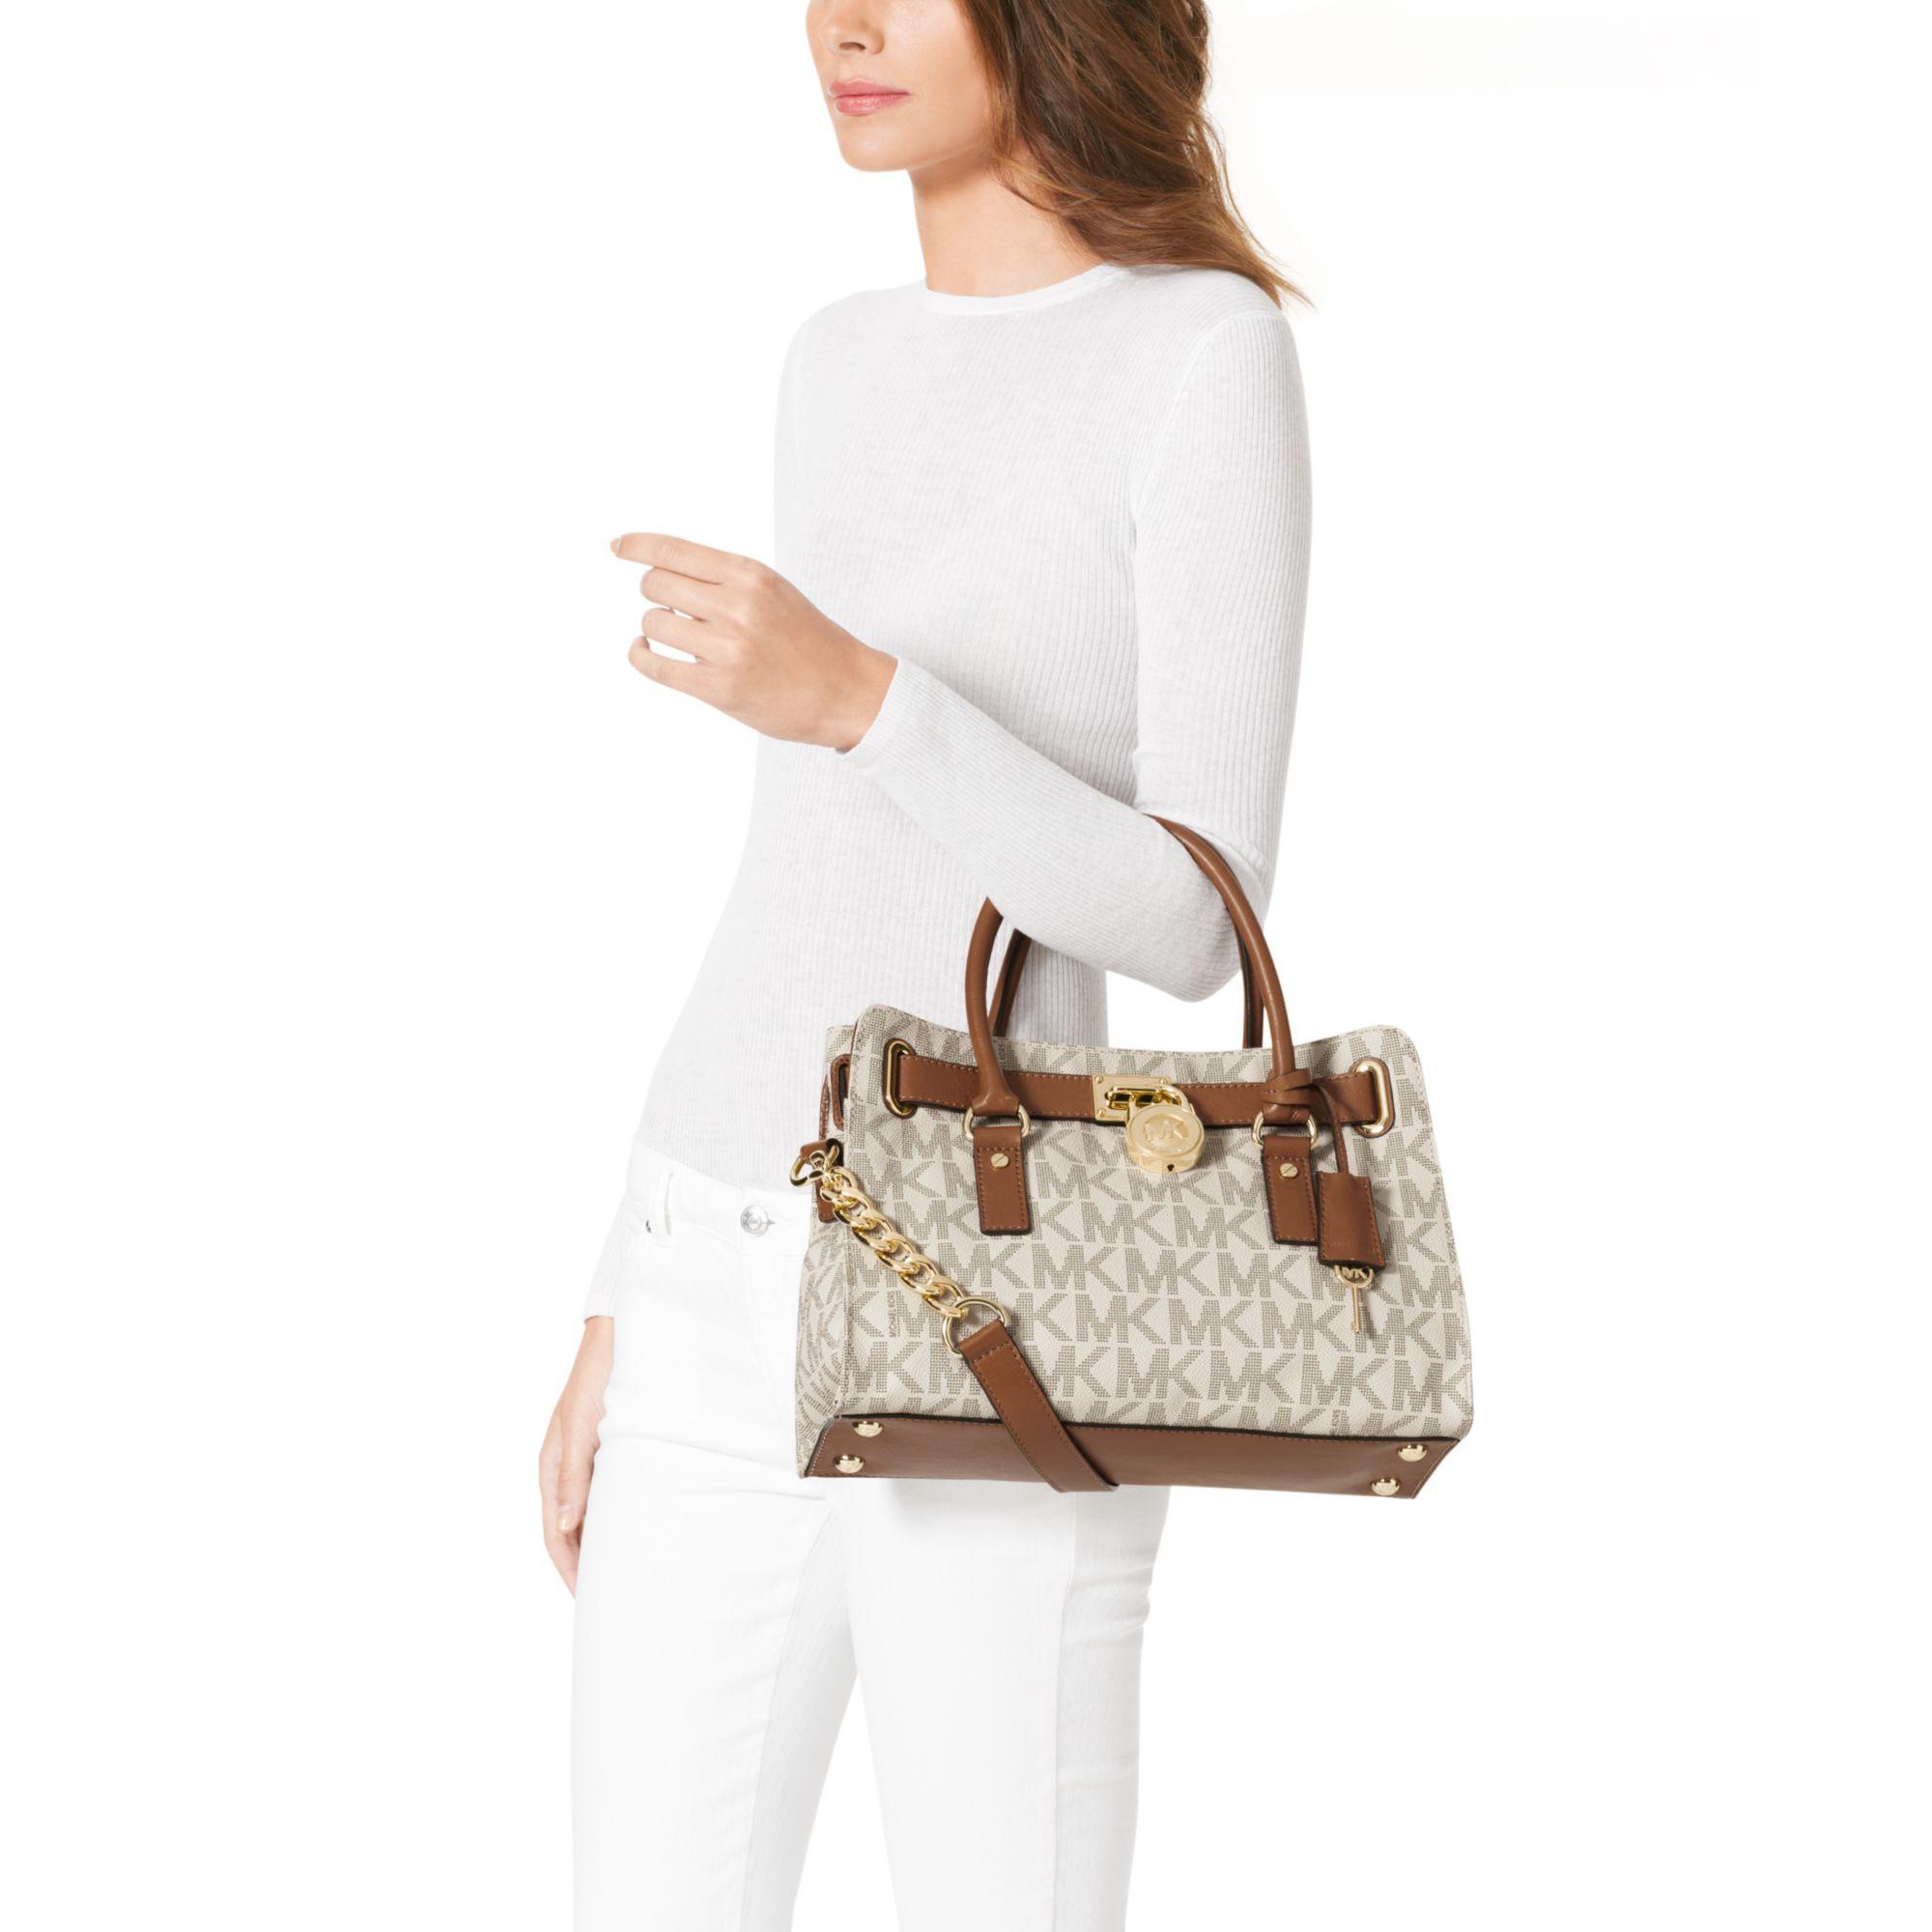 a8ebd1ae7711 ... cheap lyst michael kors hamilton medium logo satchel in white 8de78  870ed